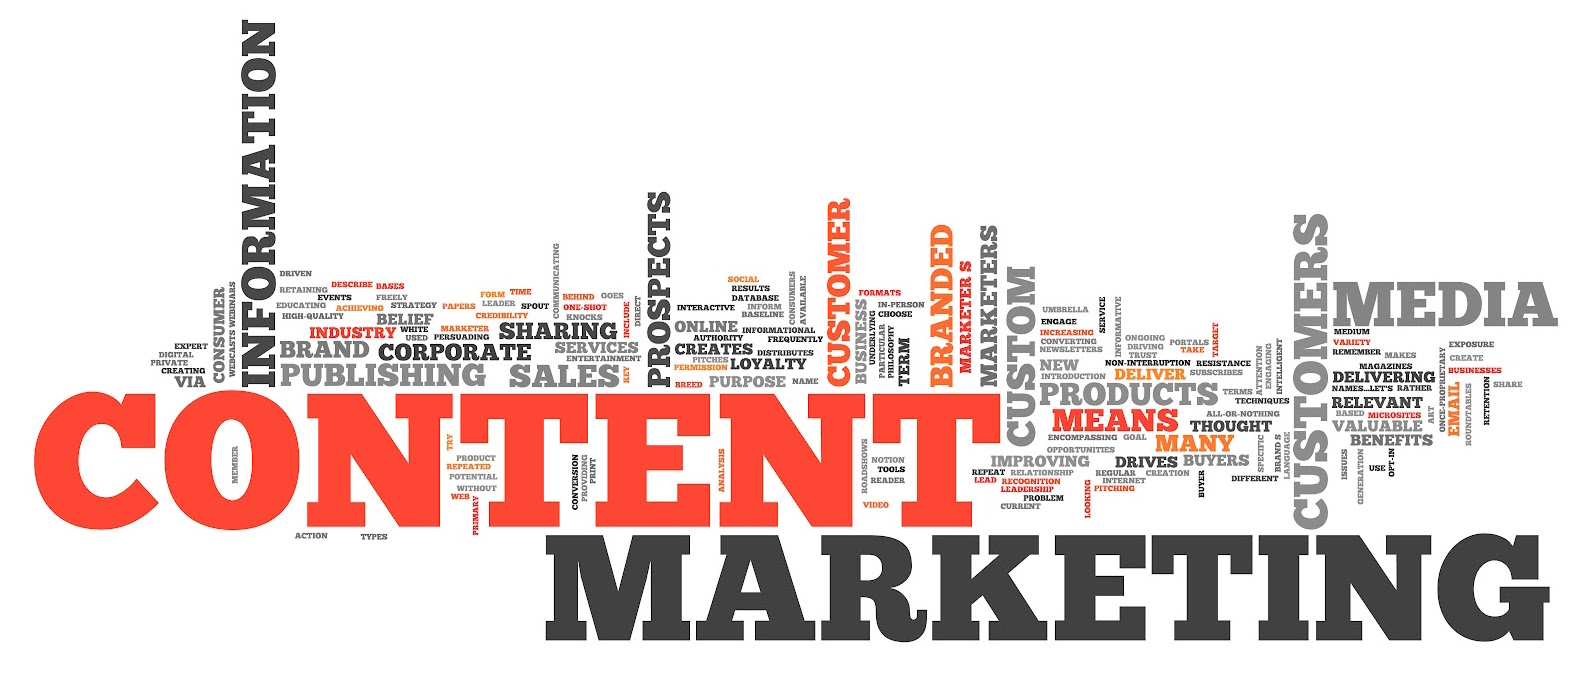 content marketing wppi 2015